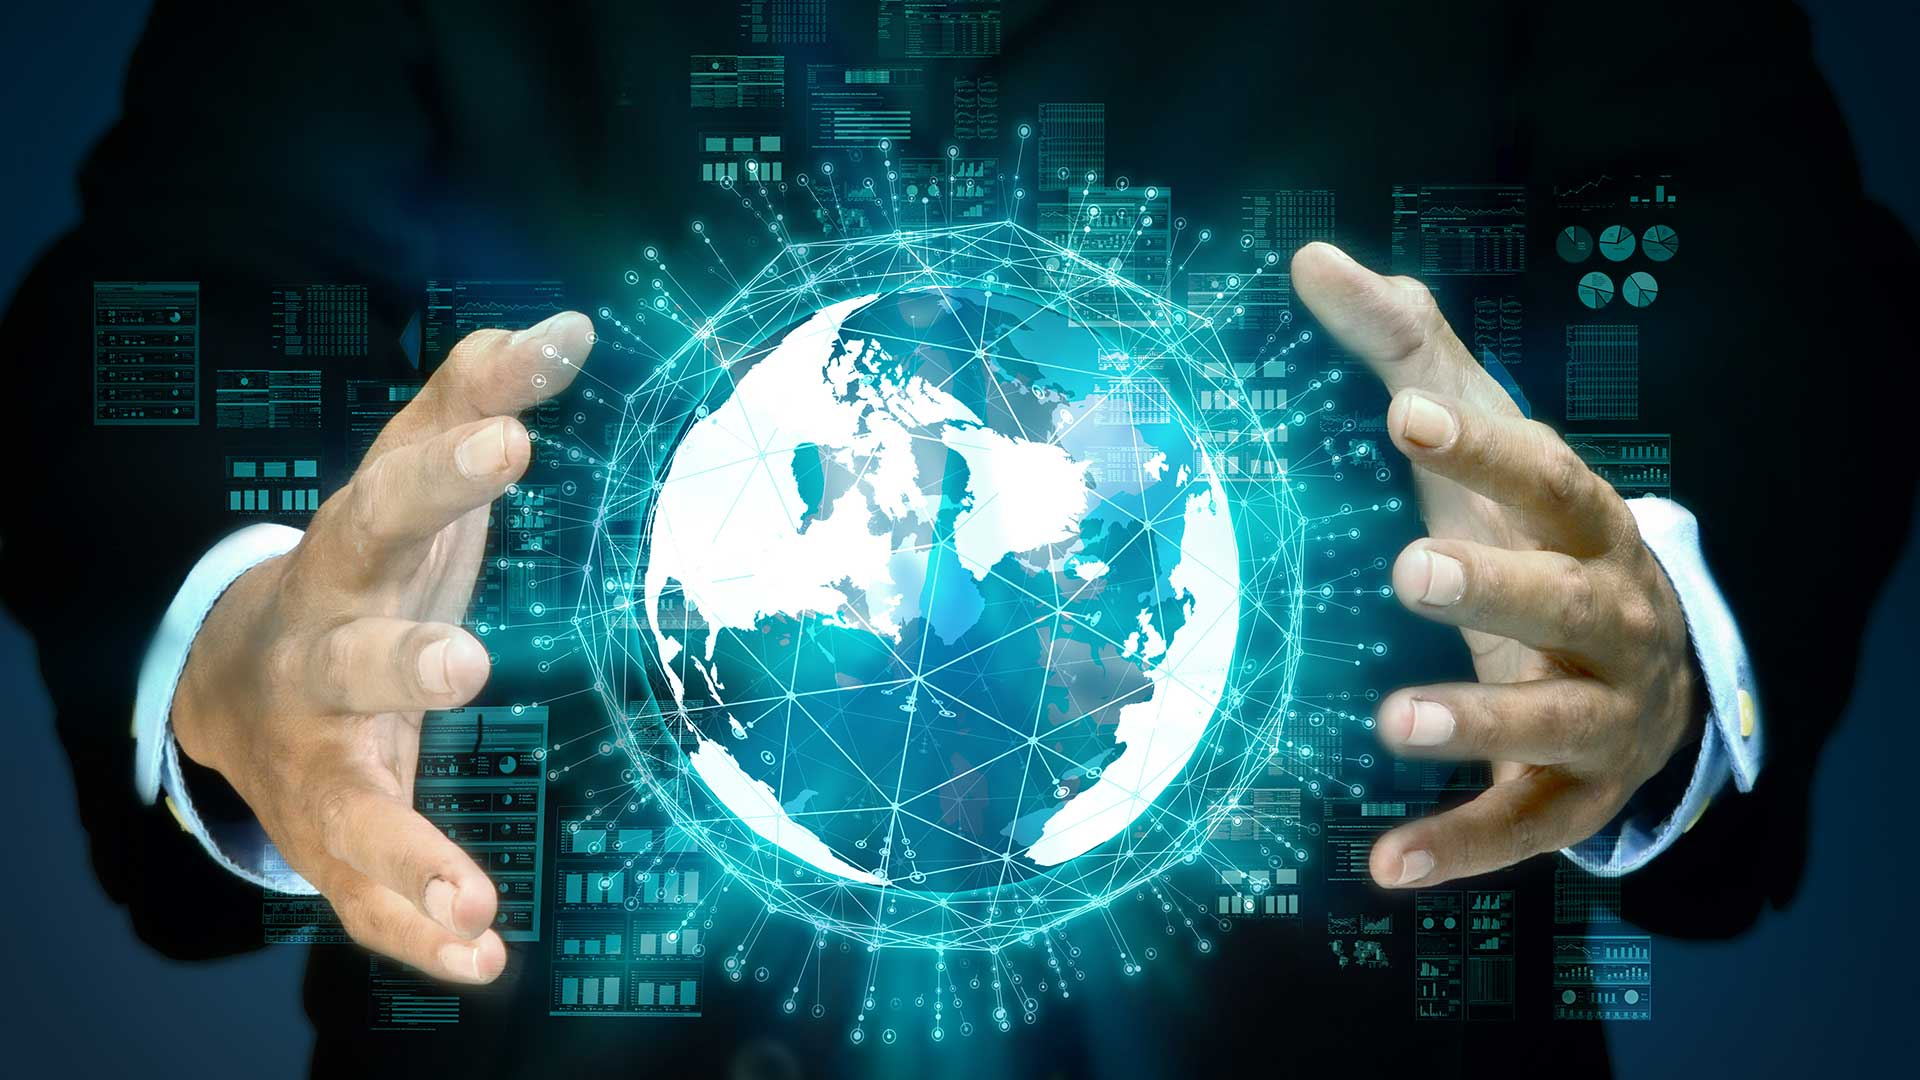 Internet big data concept